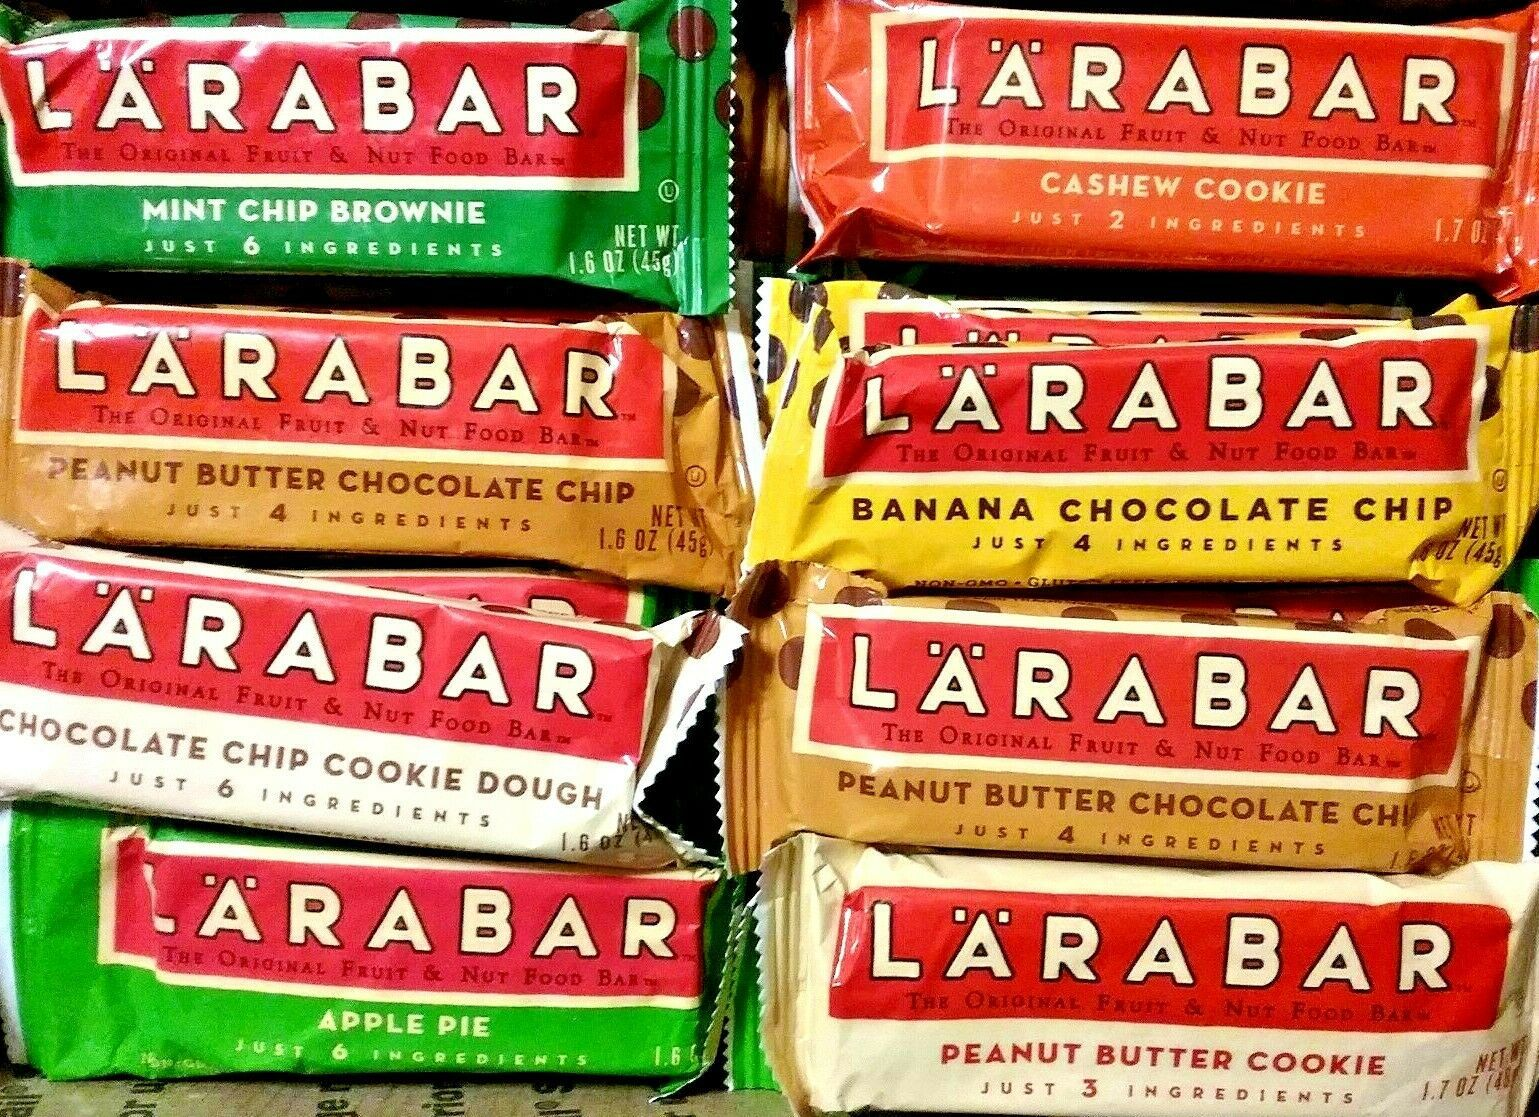 Larabars taste SO GOOD! Vegan. Certified gluten free